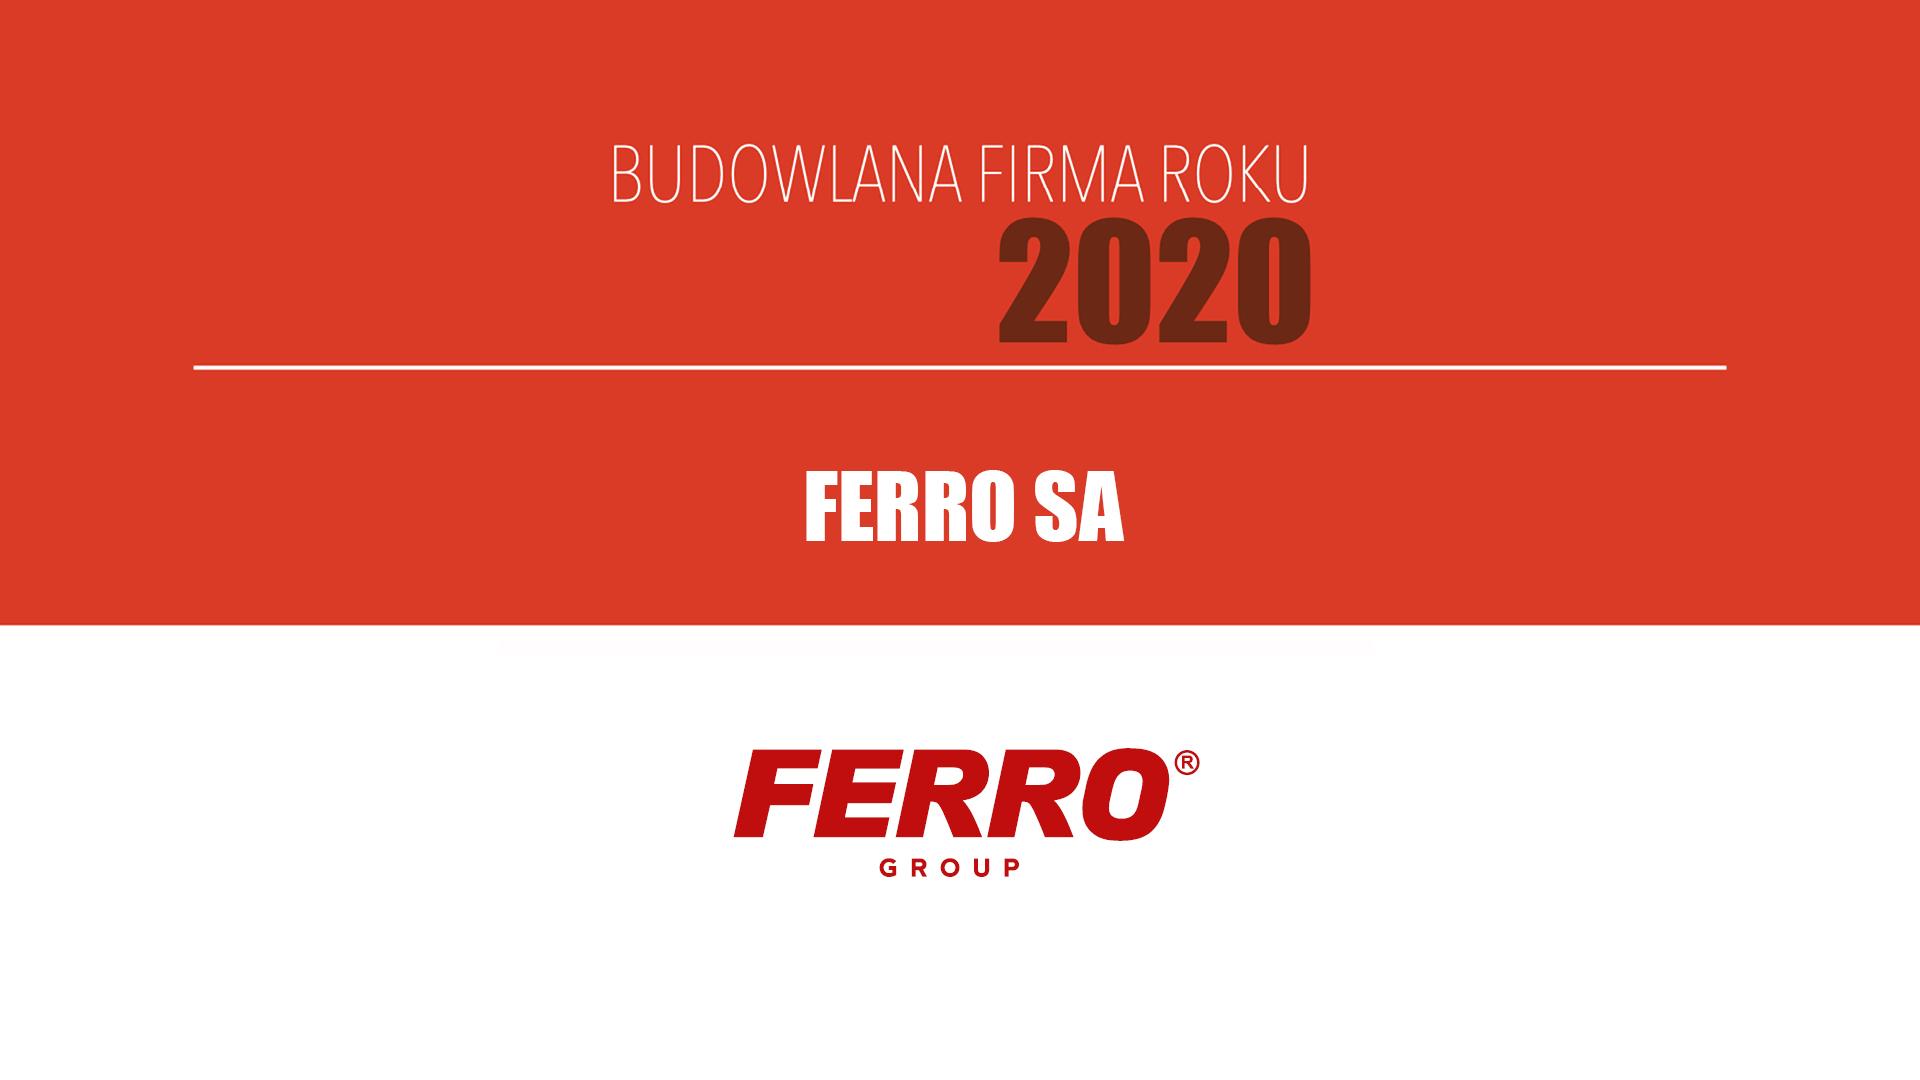 FERRO SA – Budowlana Firma Roku 2020